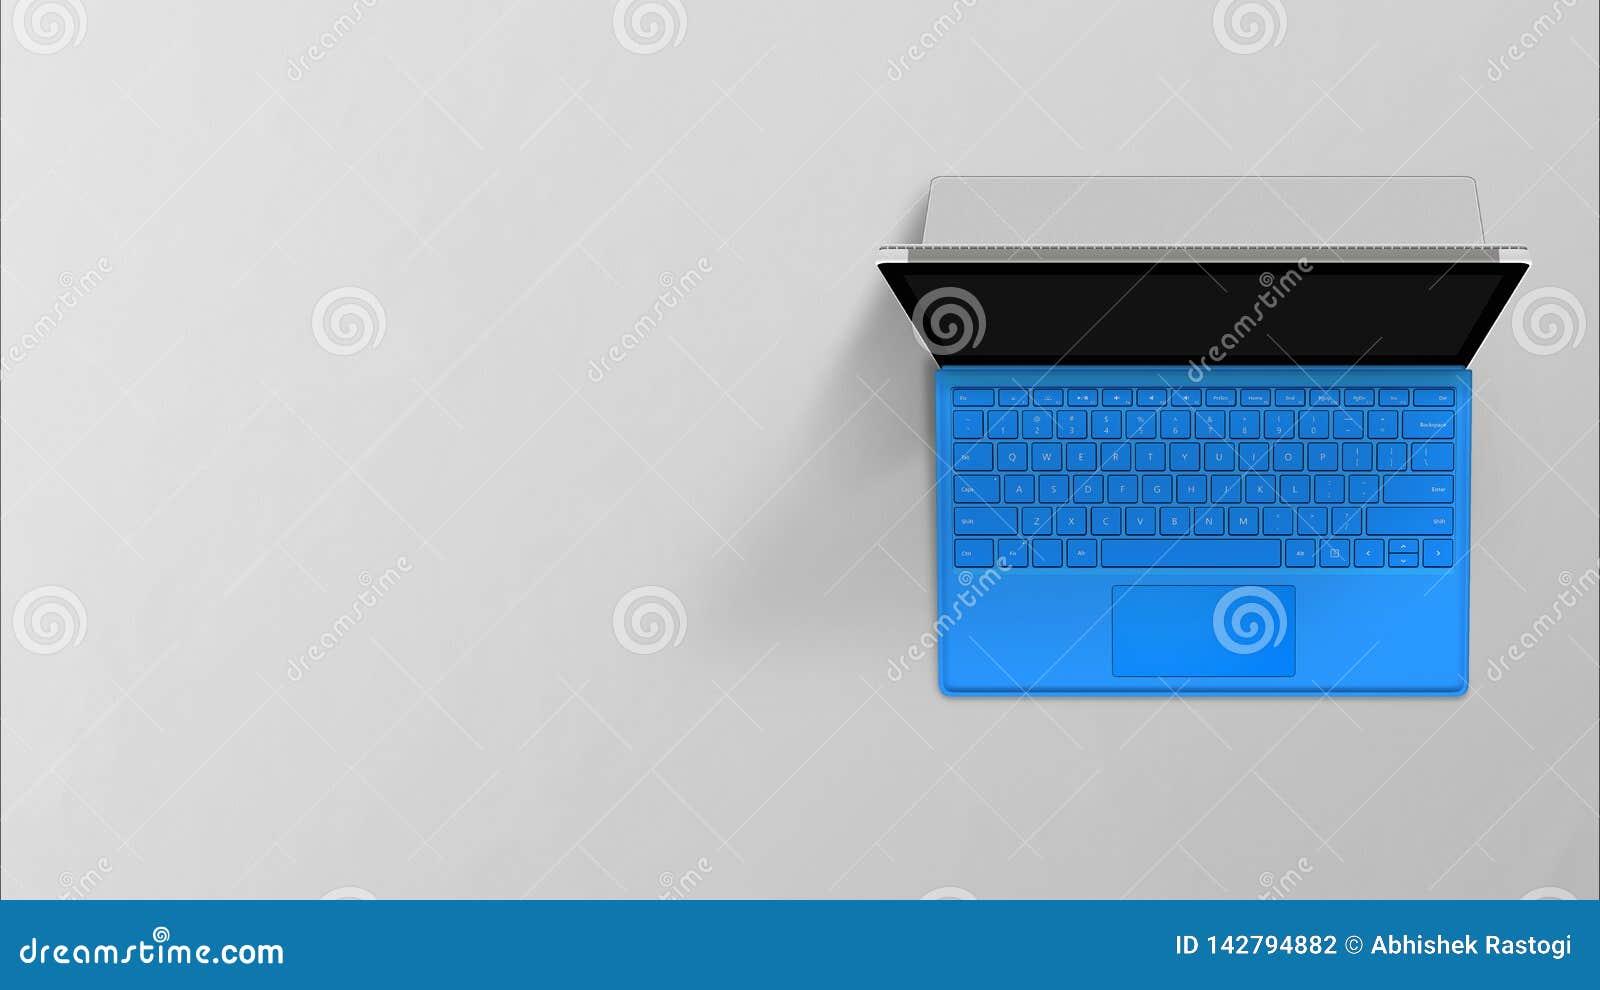 Modern retina laptop with English keyboard  on white background